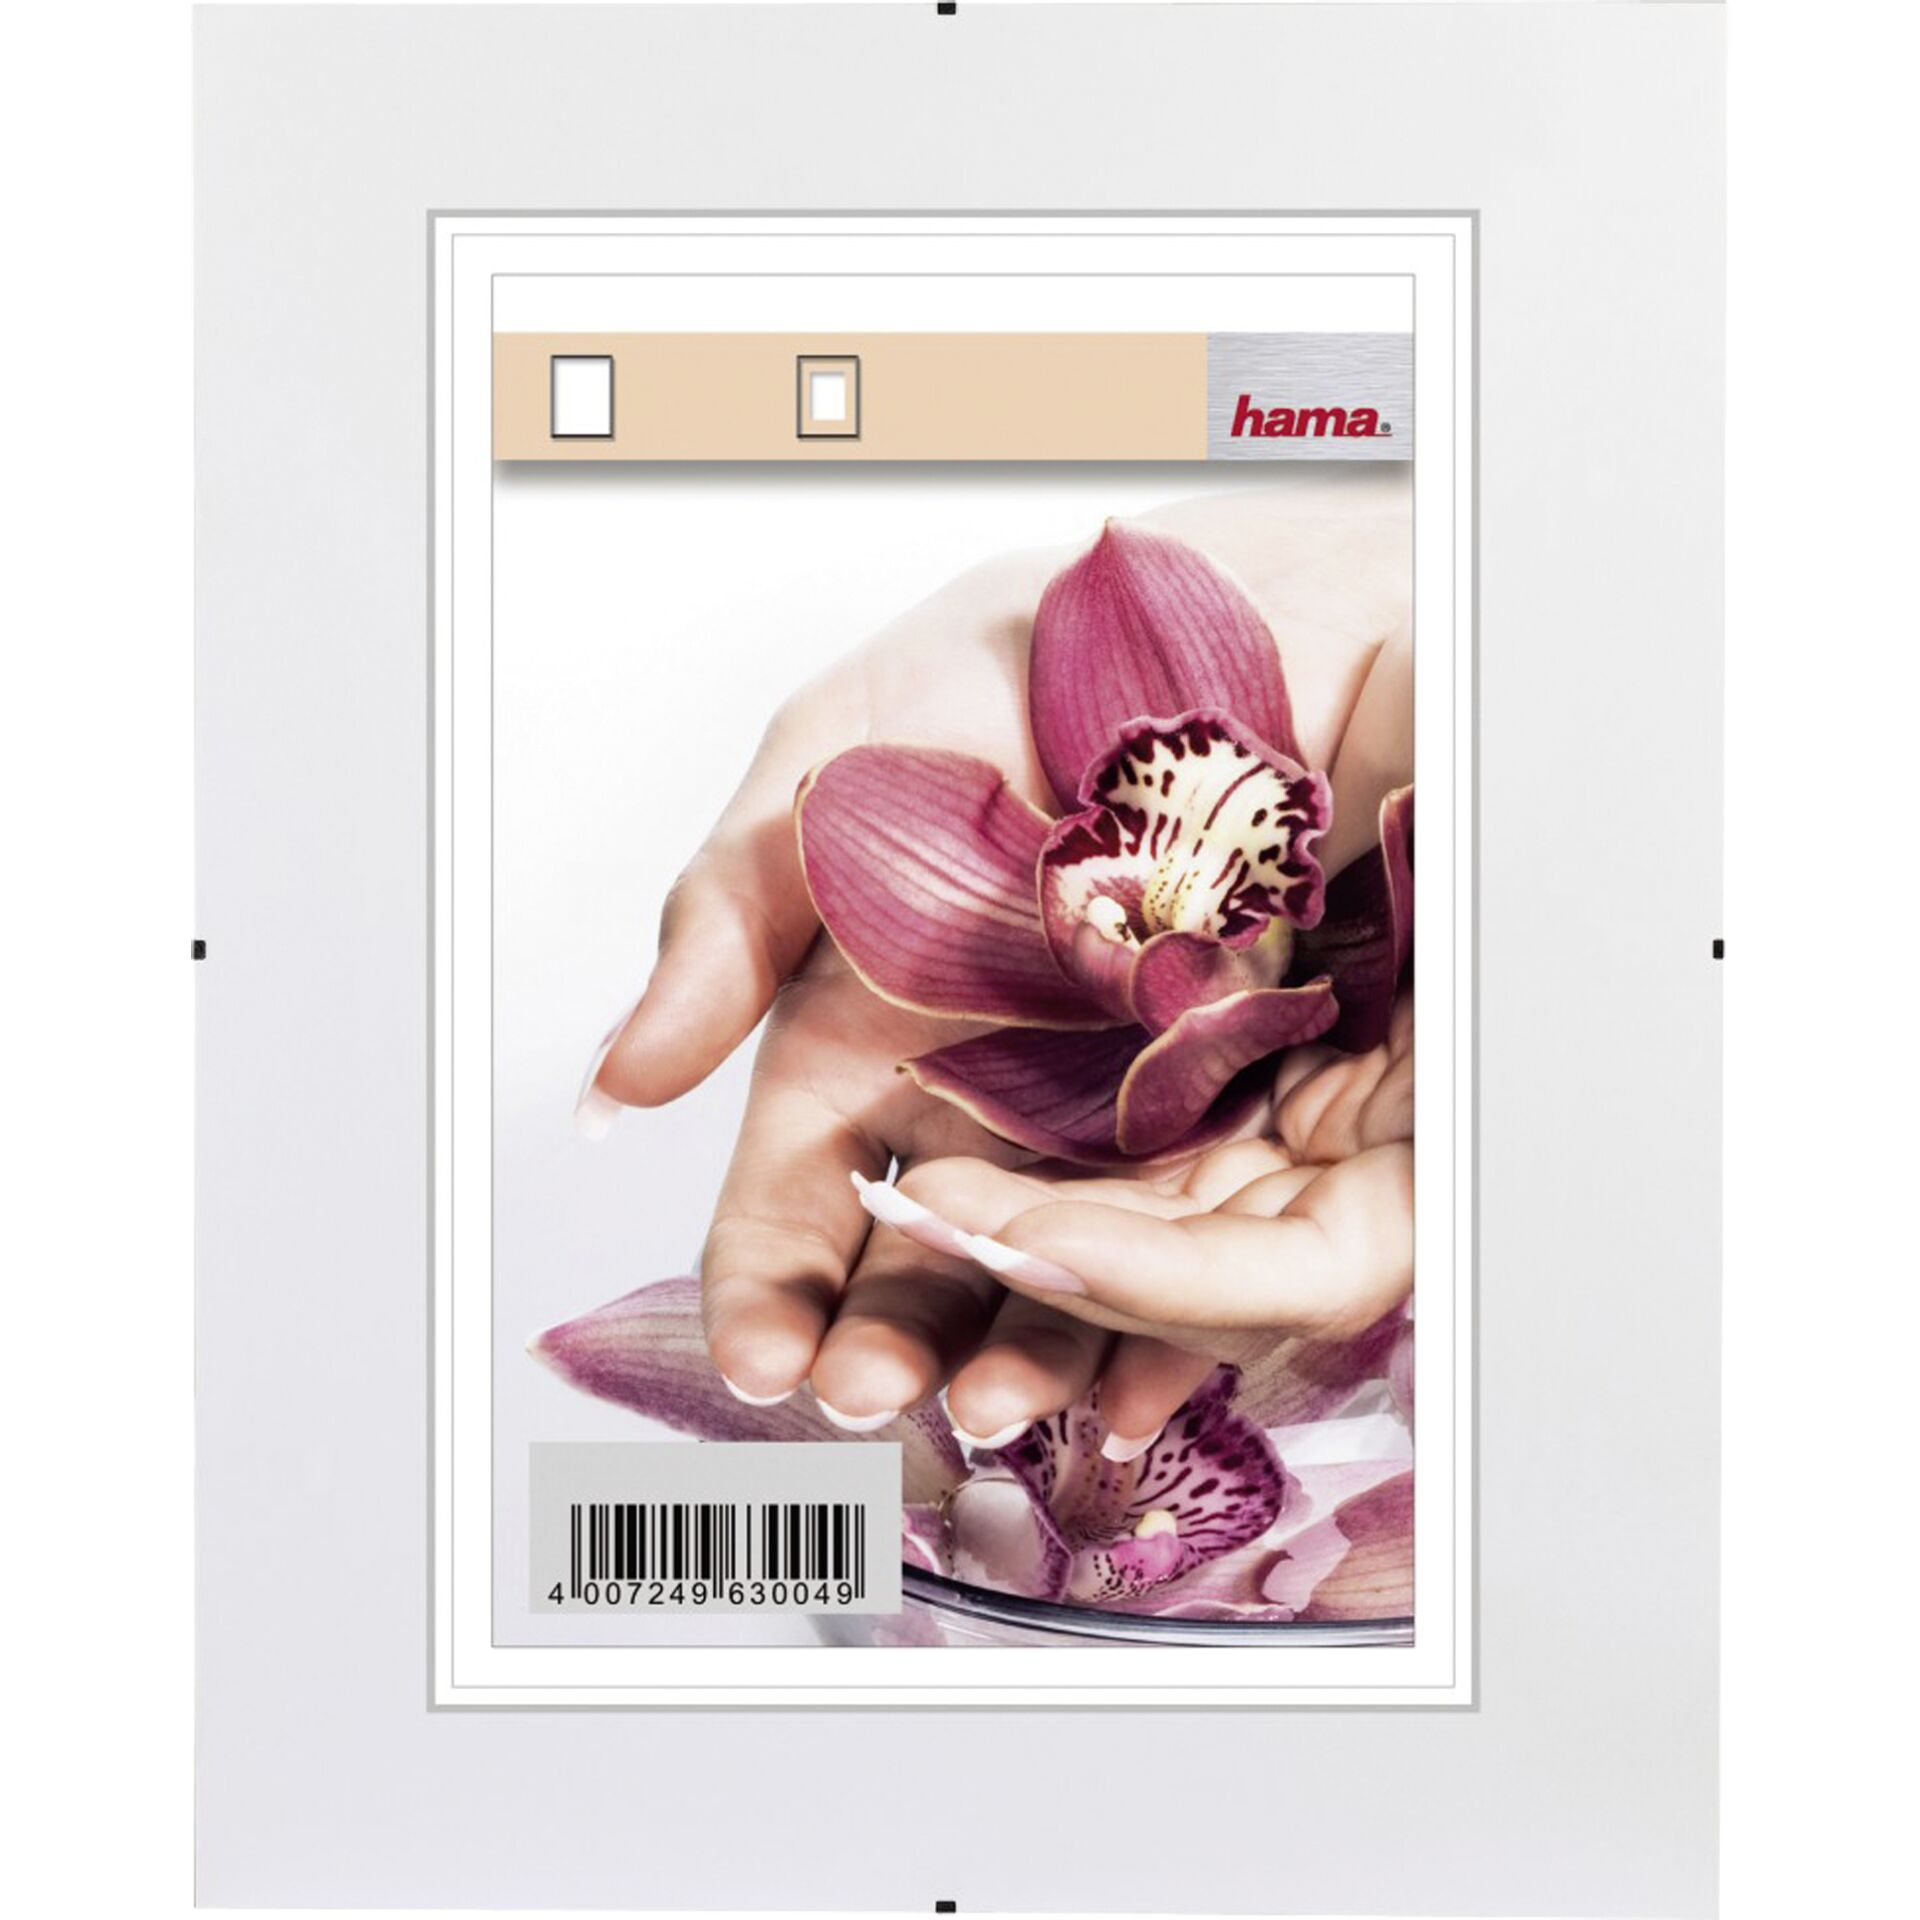 Hama Clip-Fix NG         10,5x15 rahmenloser Bildhalter     63002